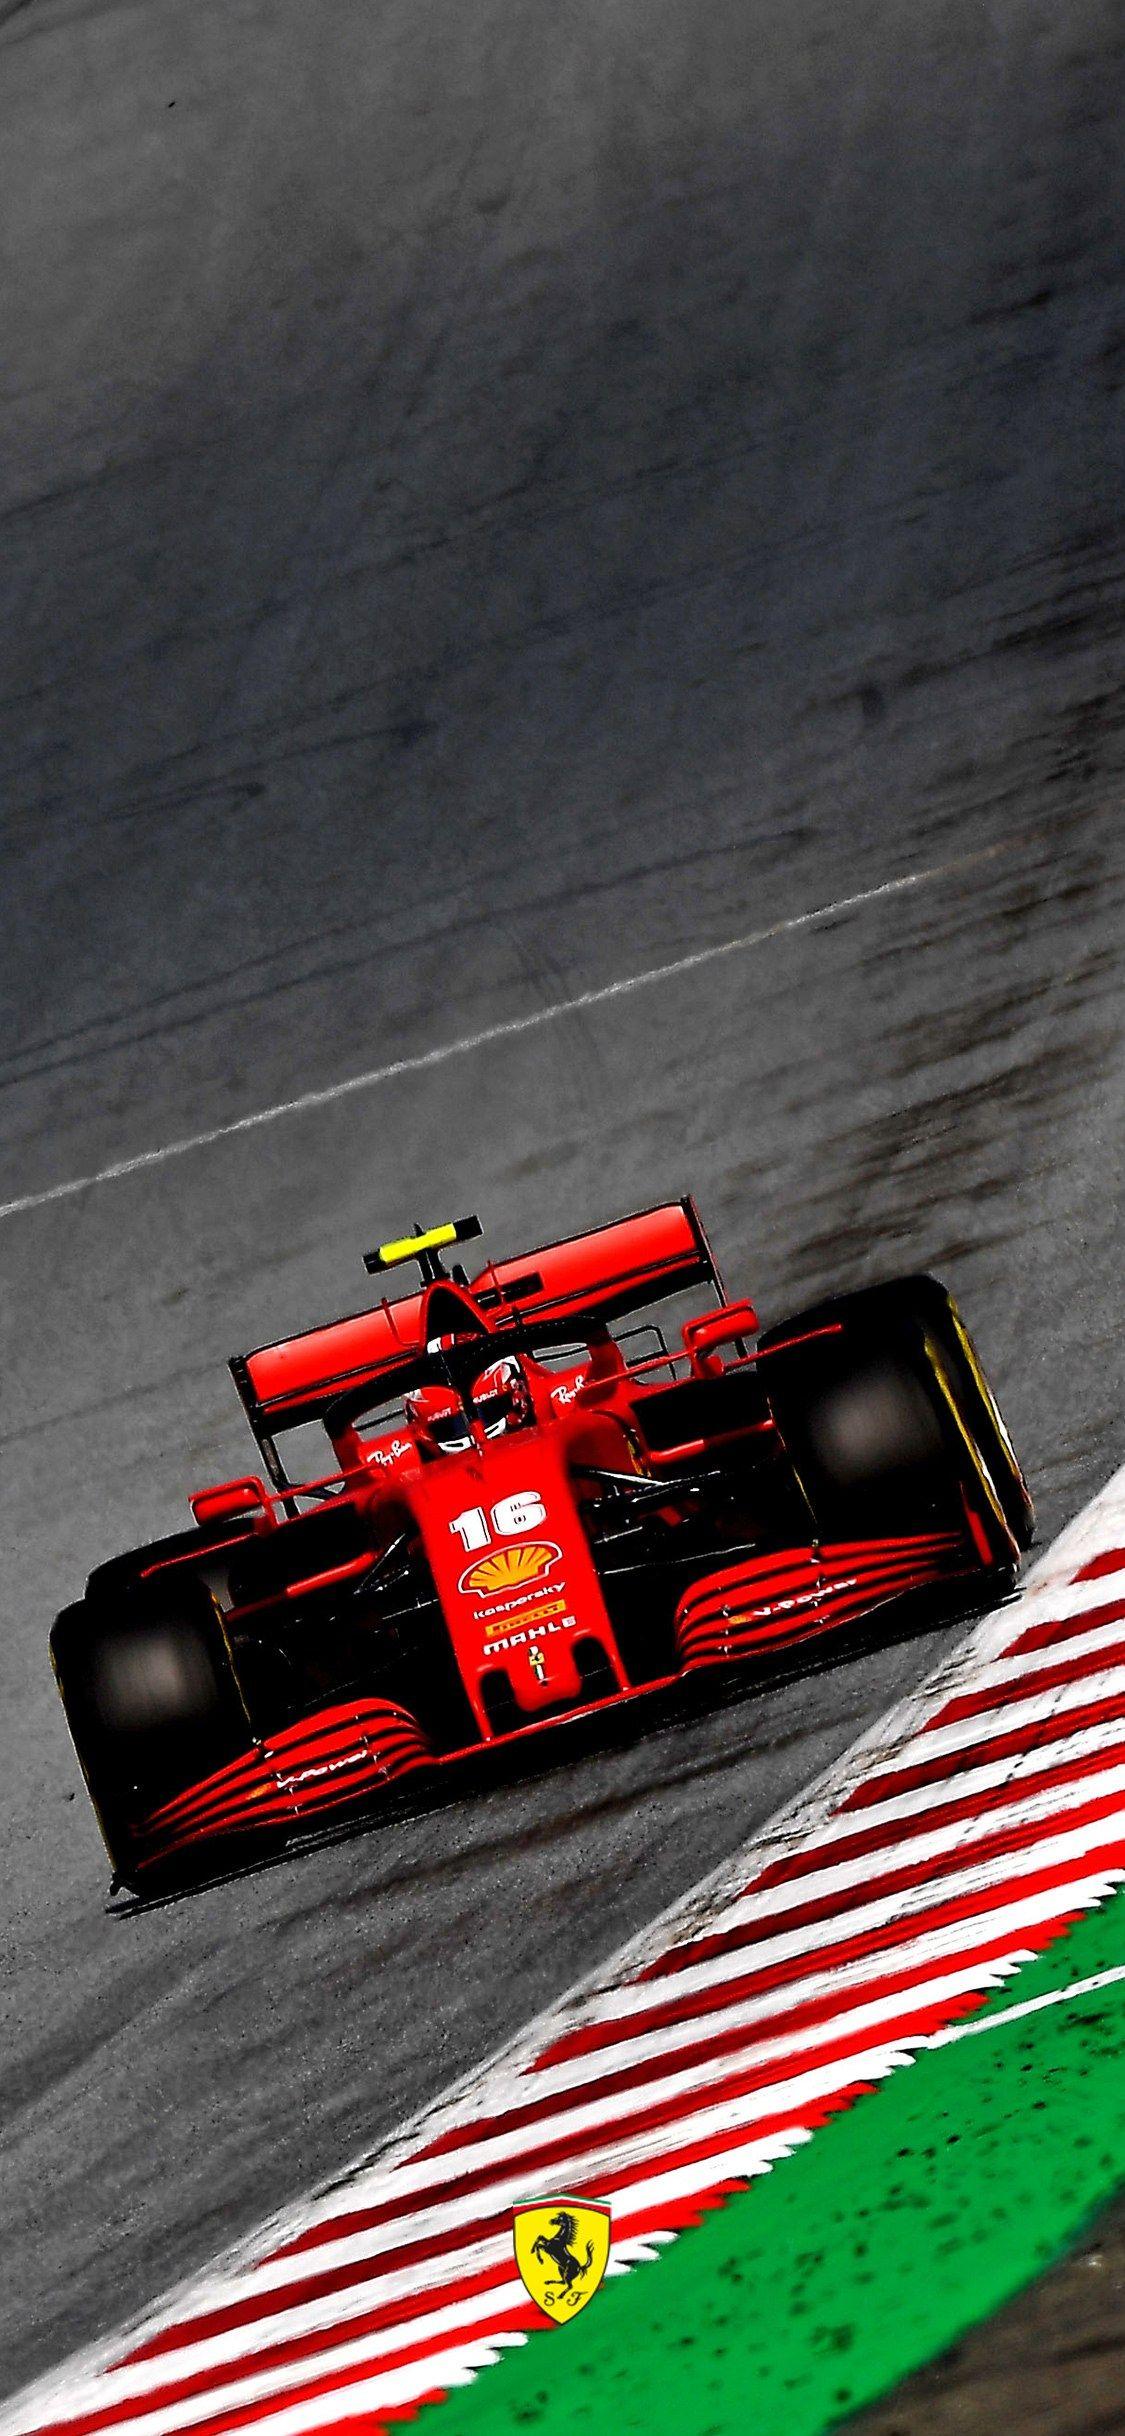 Wallpaper – iPhone/Android – Ferrari